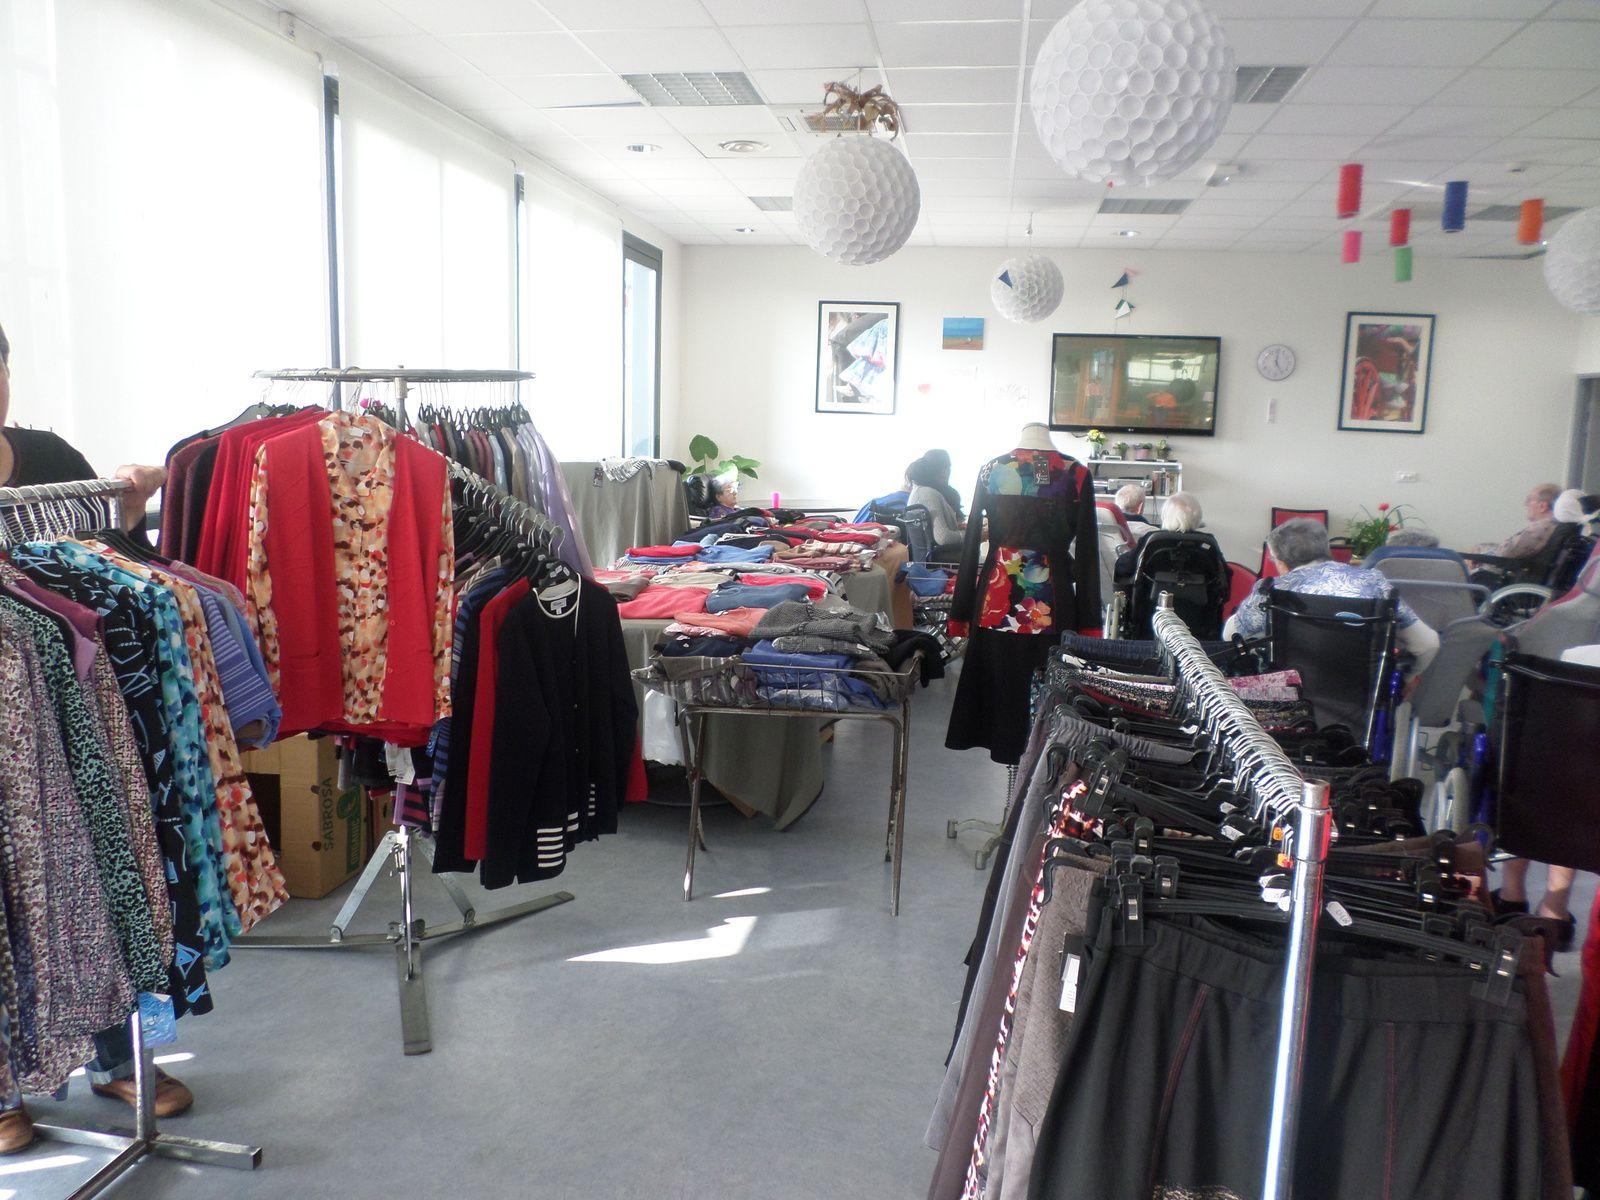 Accordéon, Expo-vente de vêtements